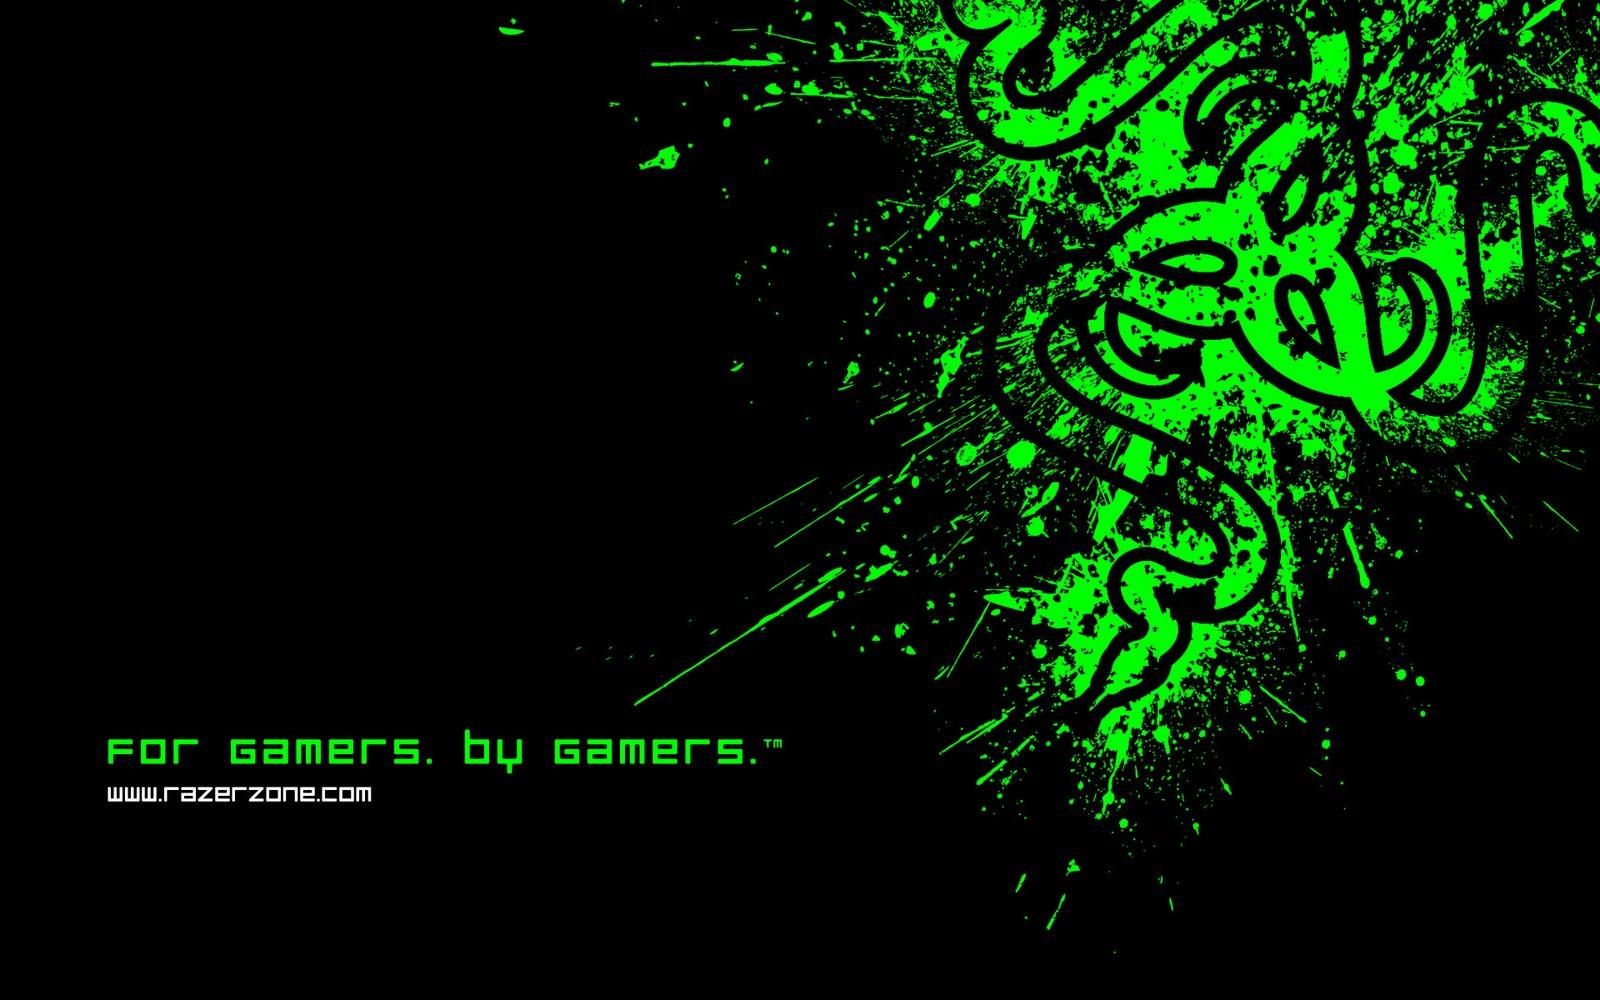 Hd wallpaper green - Cool Green Hd Wallpapers Hd Wallpapers Hdesktops Com